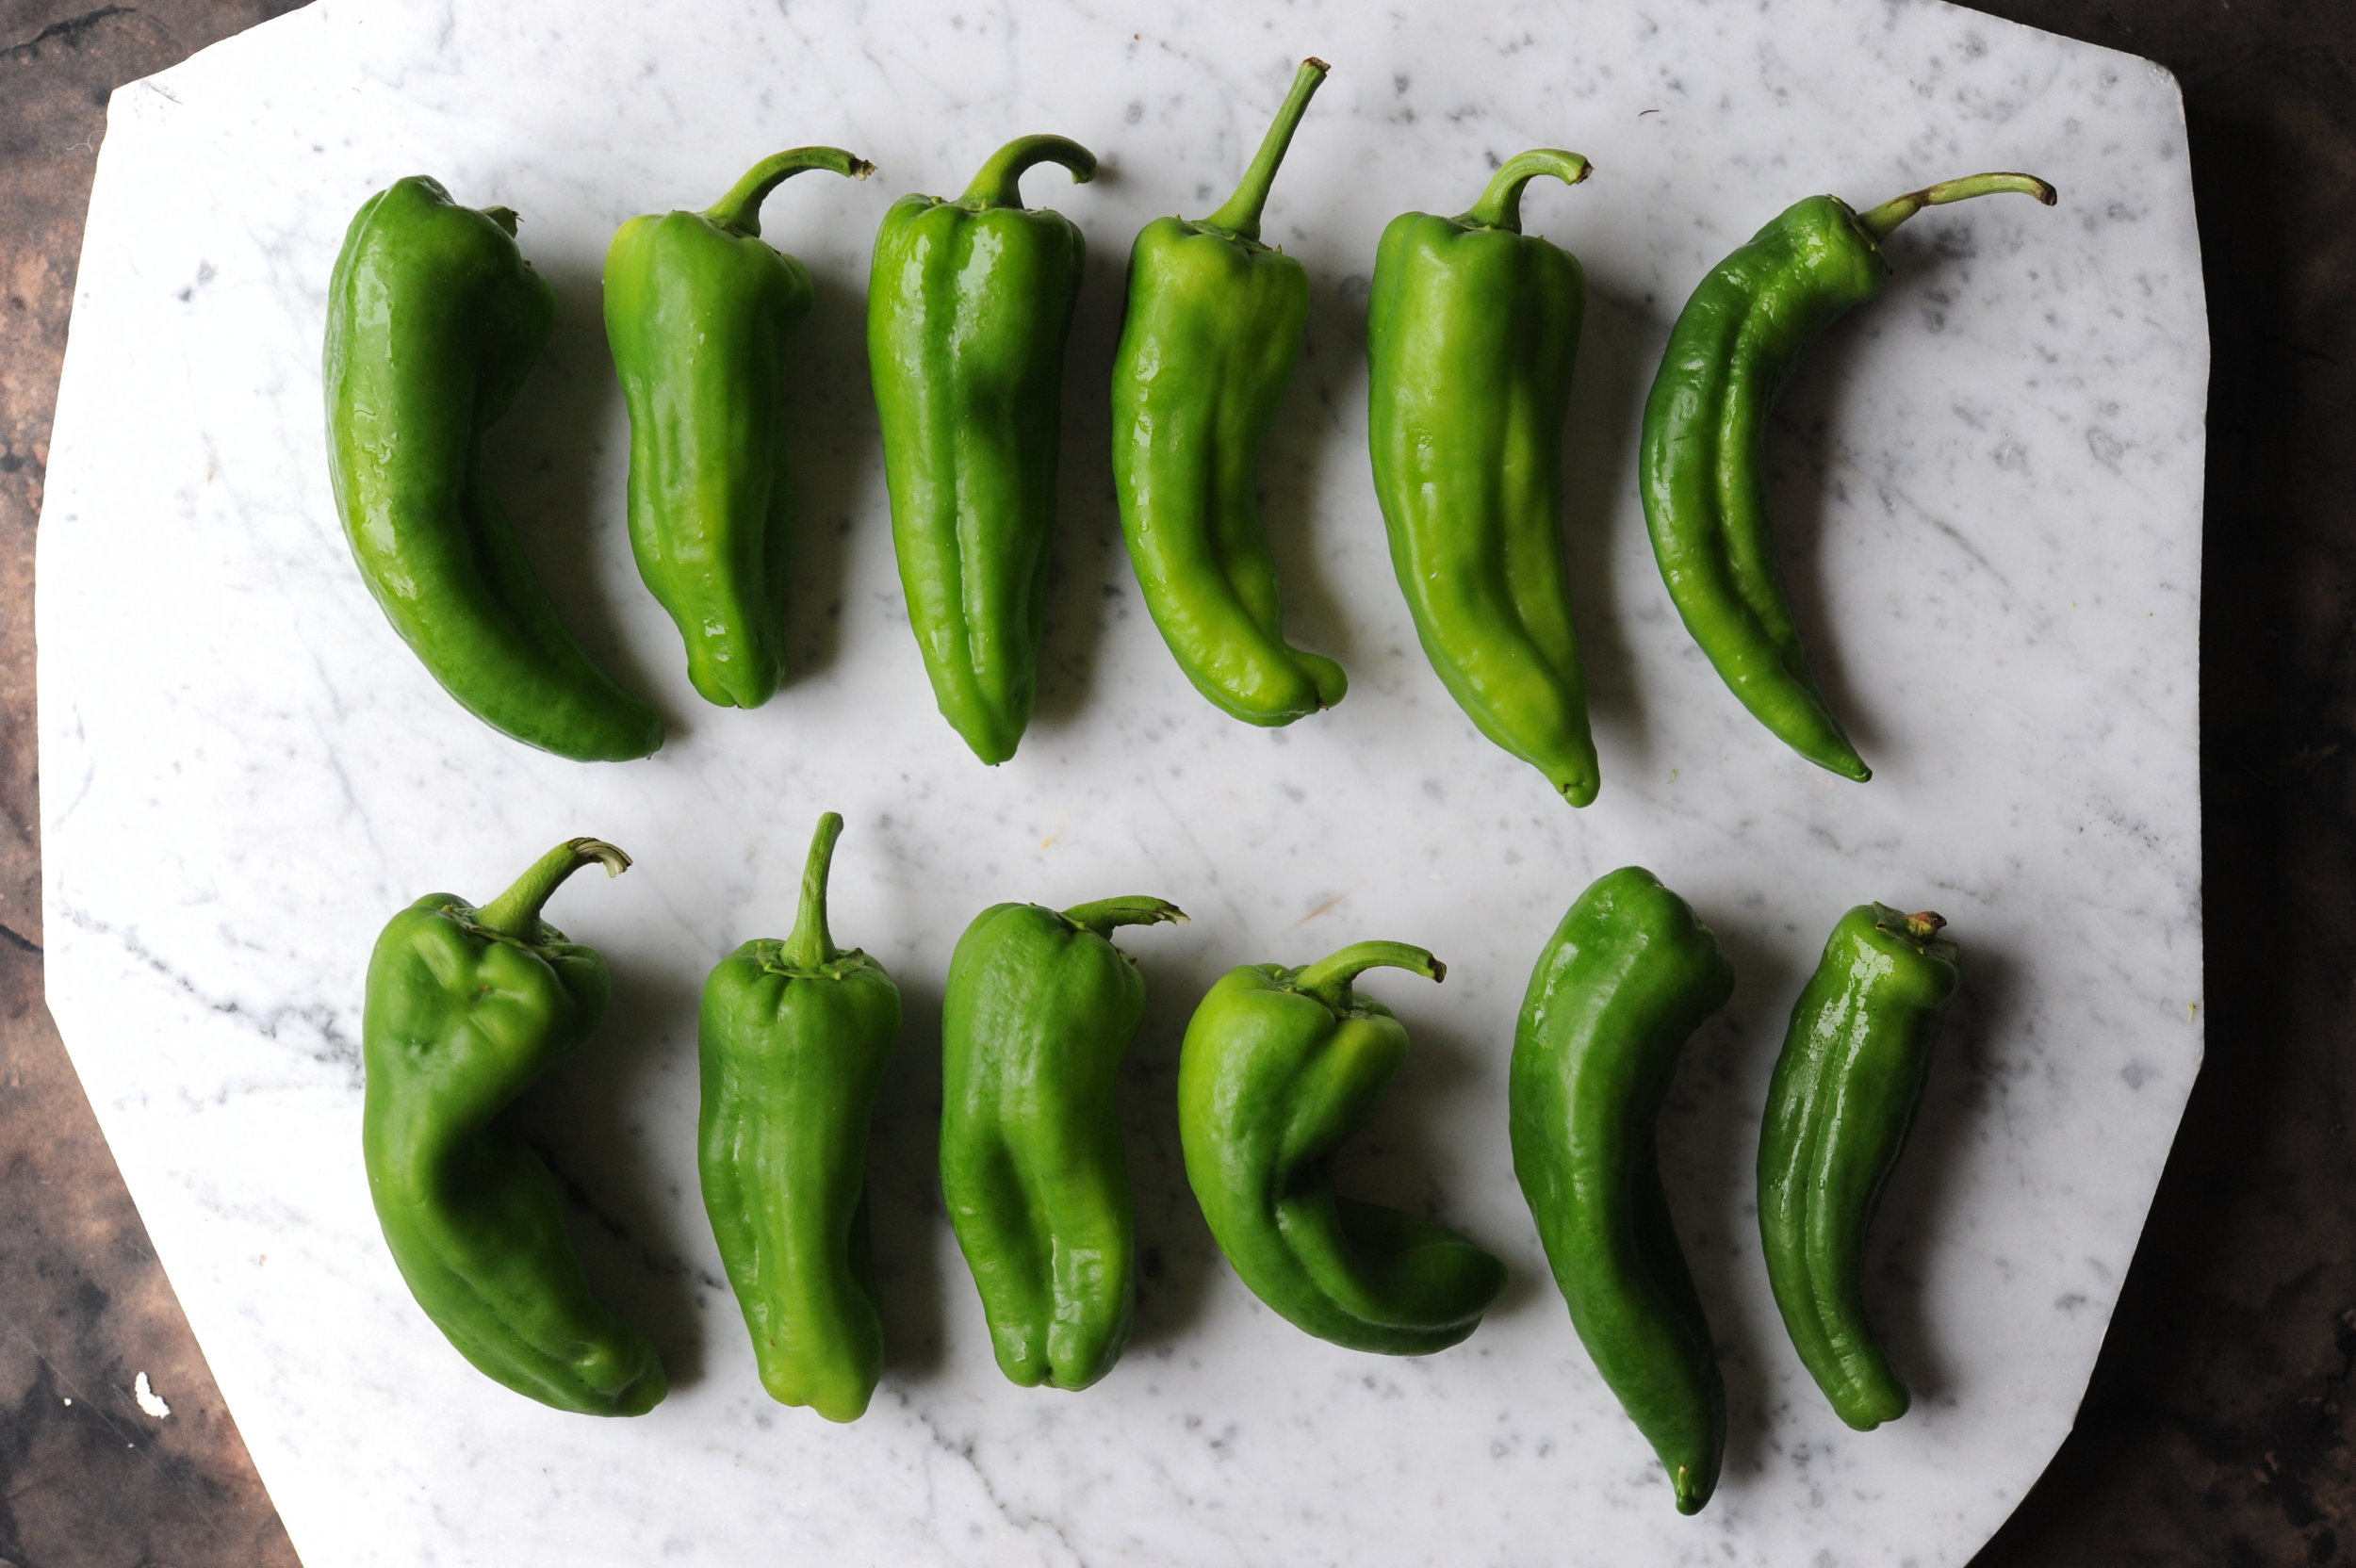 'Anaheim' peppers